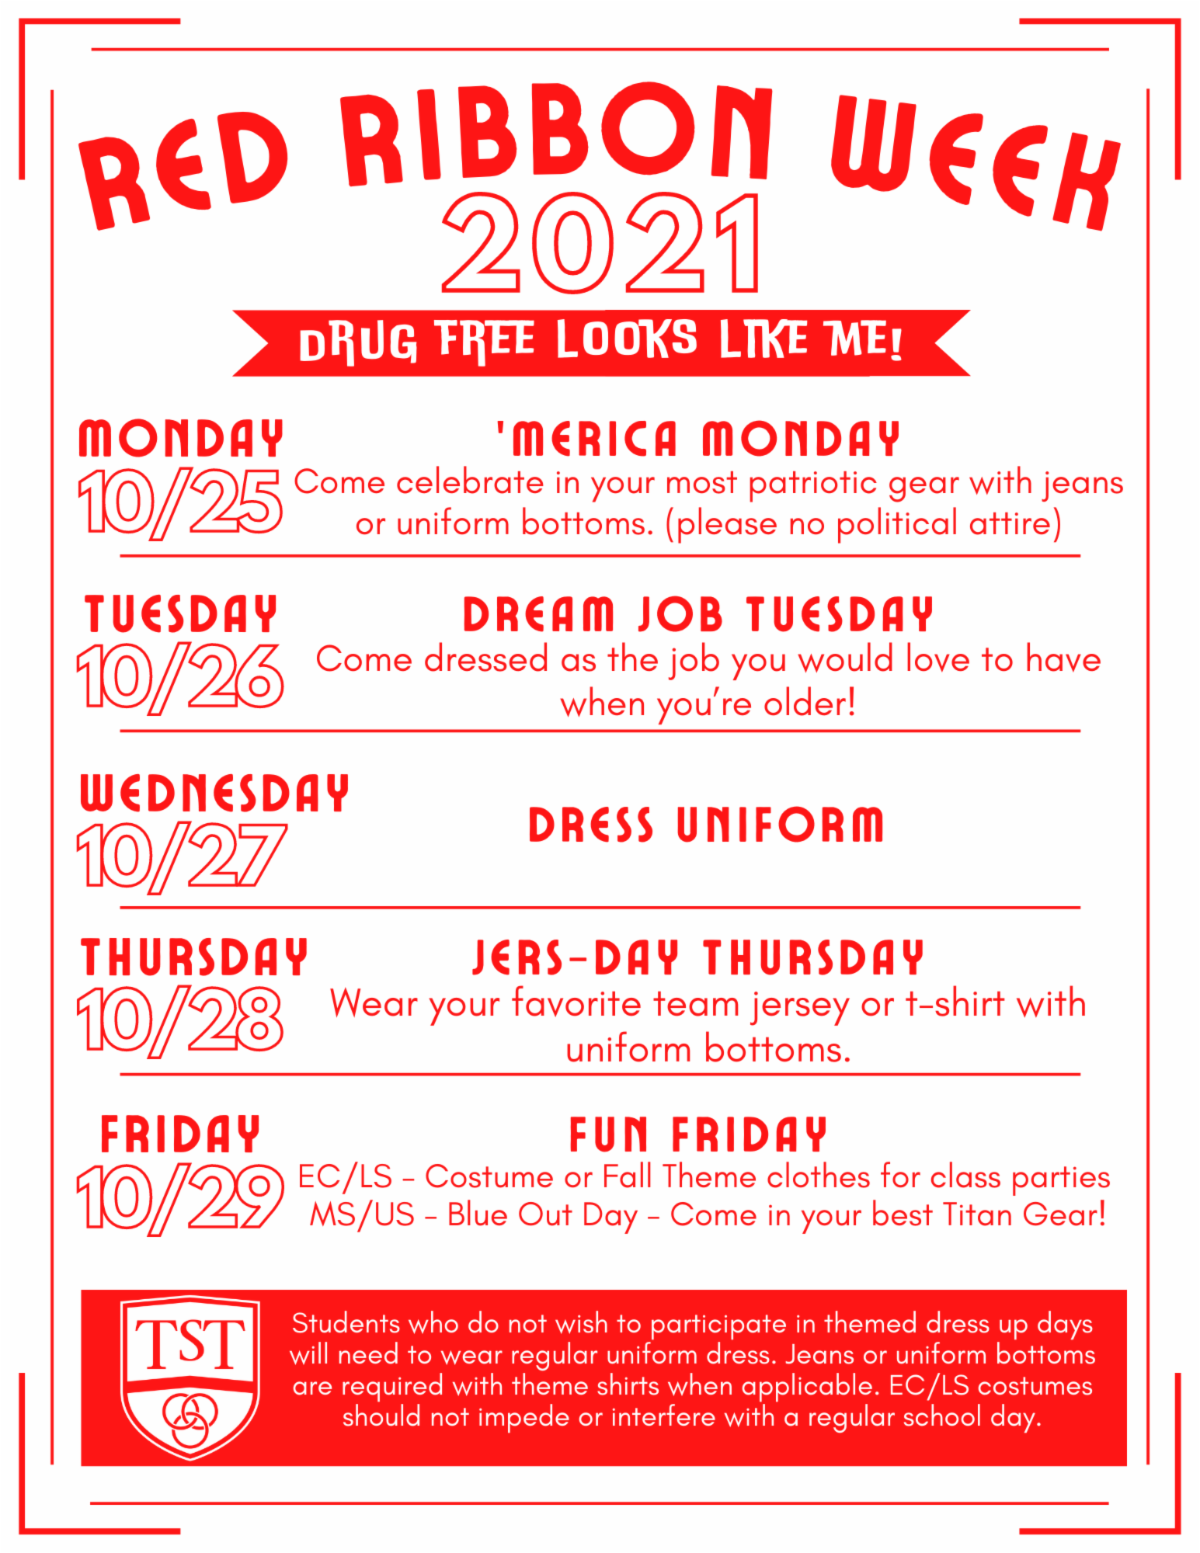 RED RIBBON WEEK 2021 _1_.png